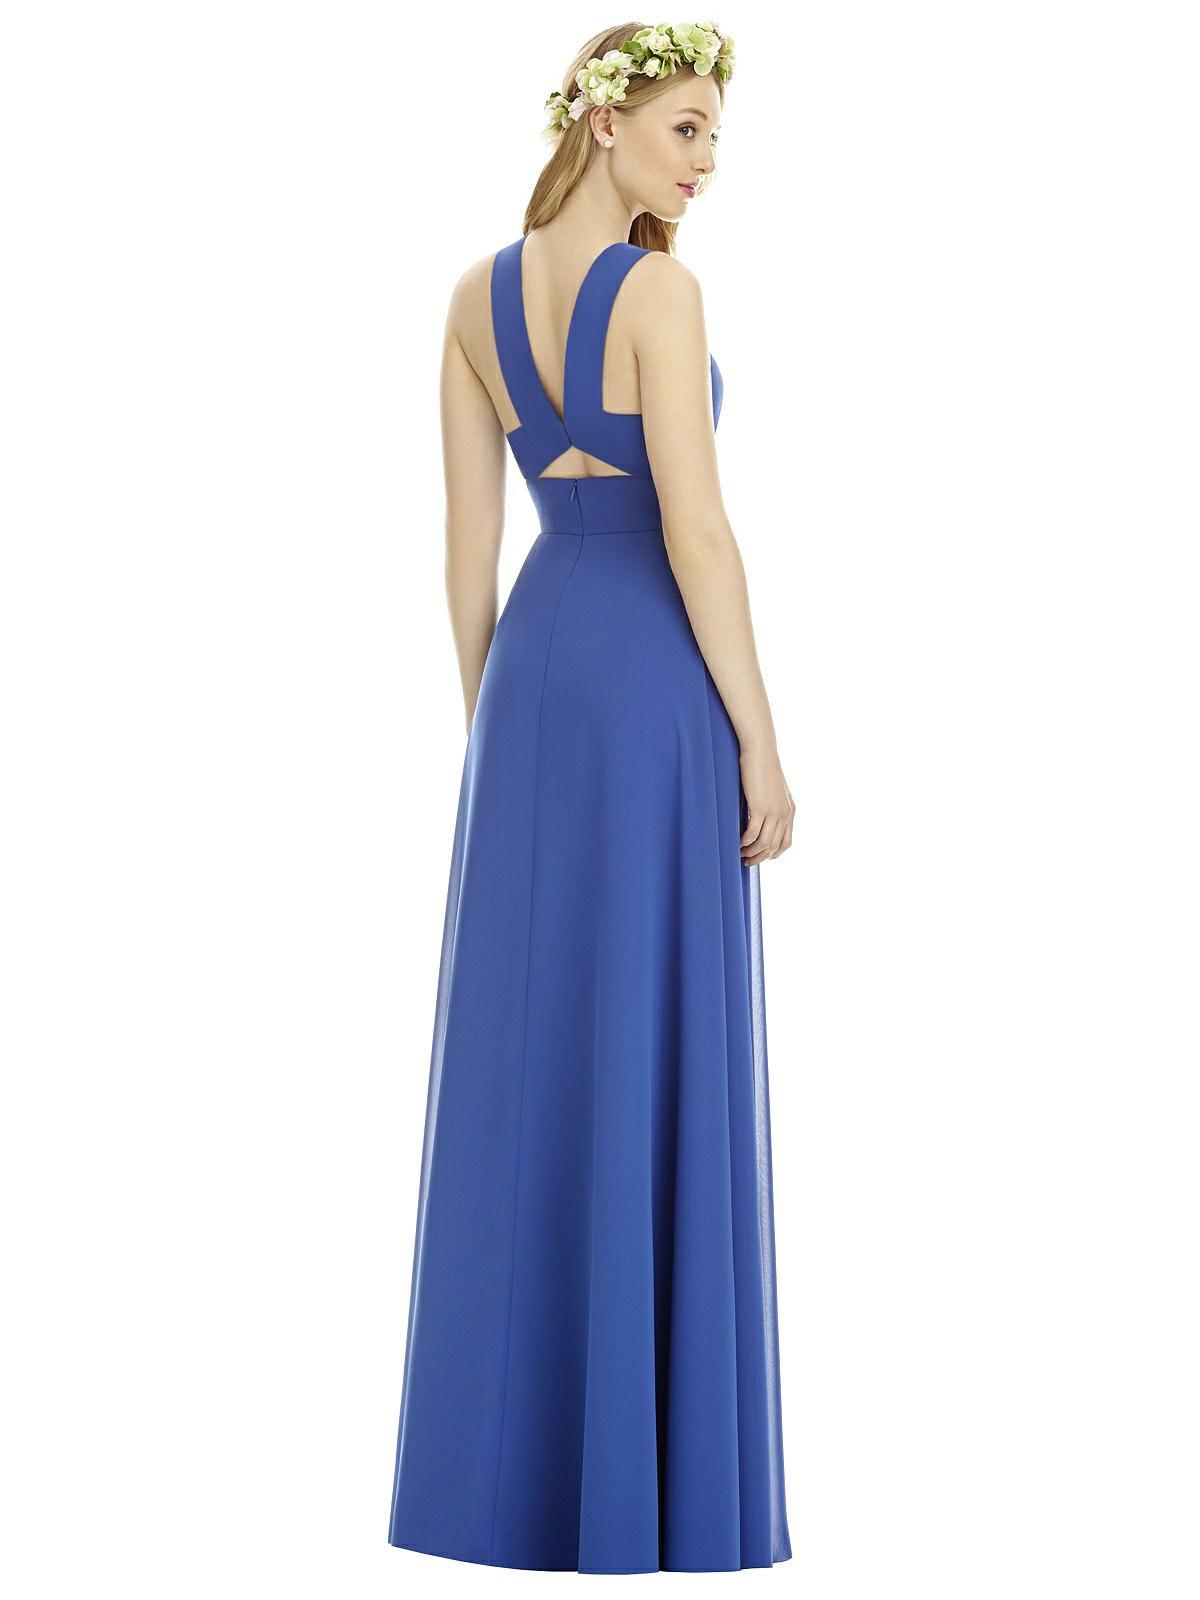 Social Bridesmaids Dress 8177 | The Dessy Group